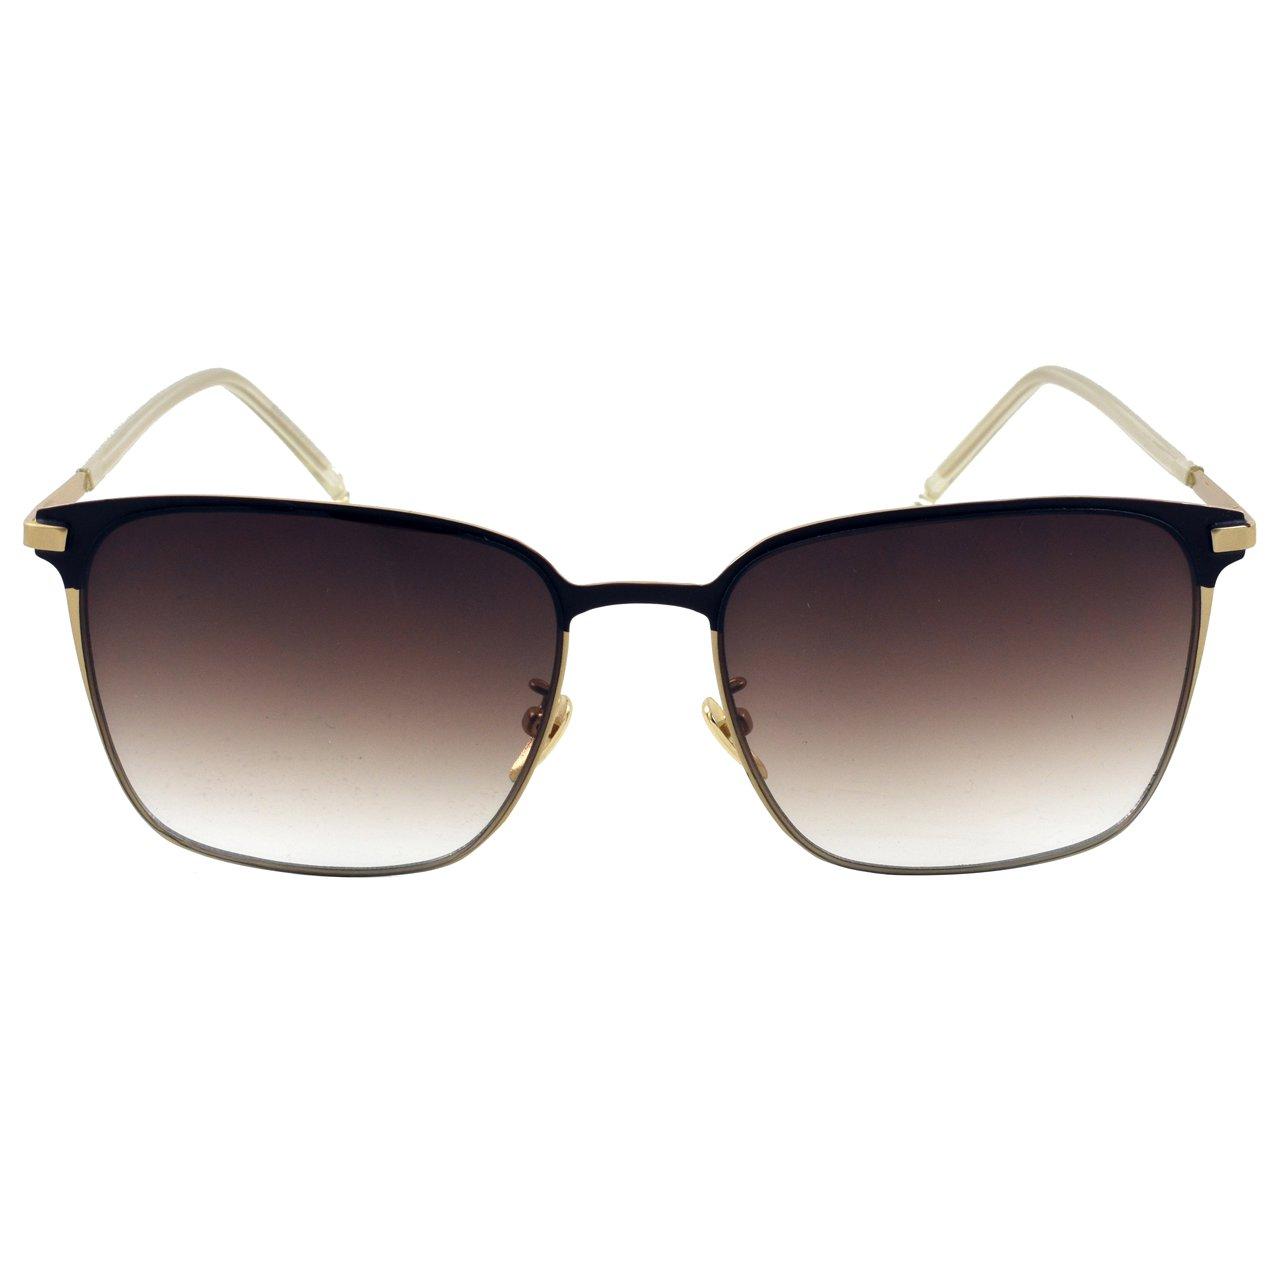 عینک آفتابی ویلی بولو مدل Deep Brown Uniti Collection